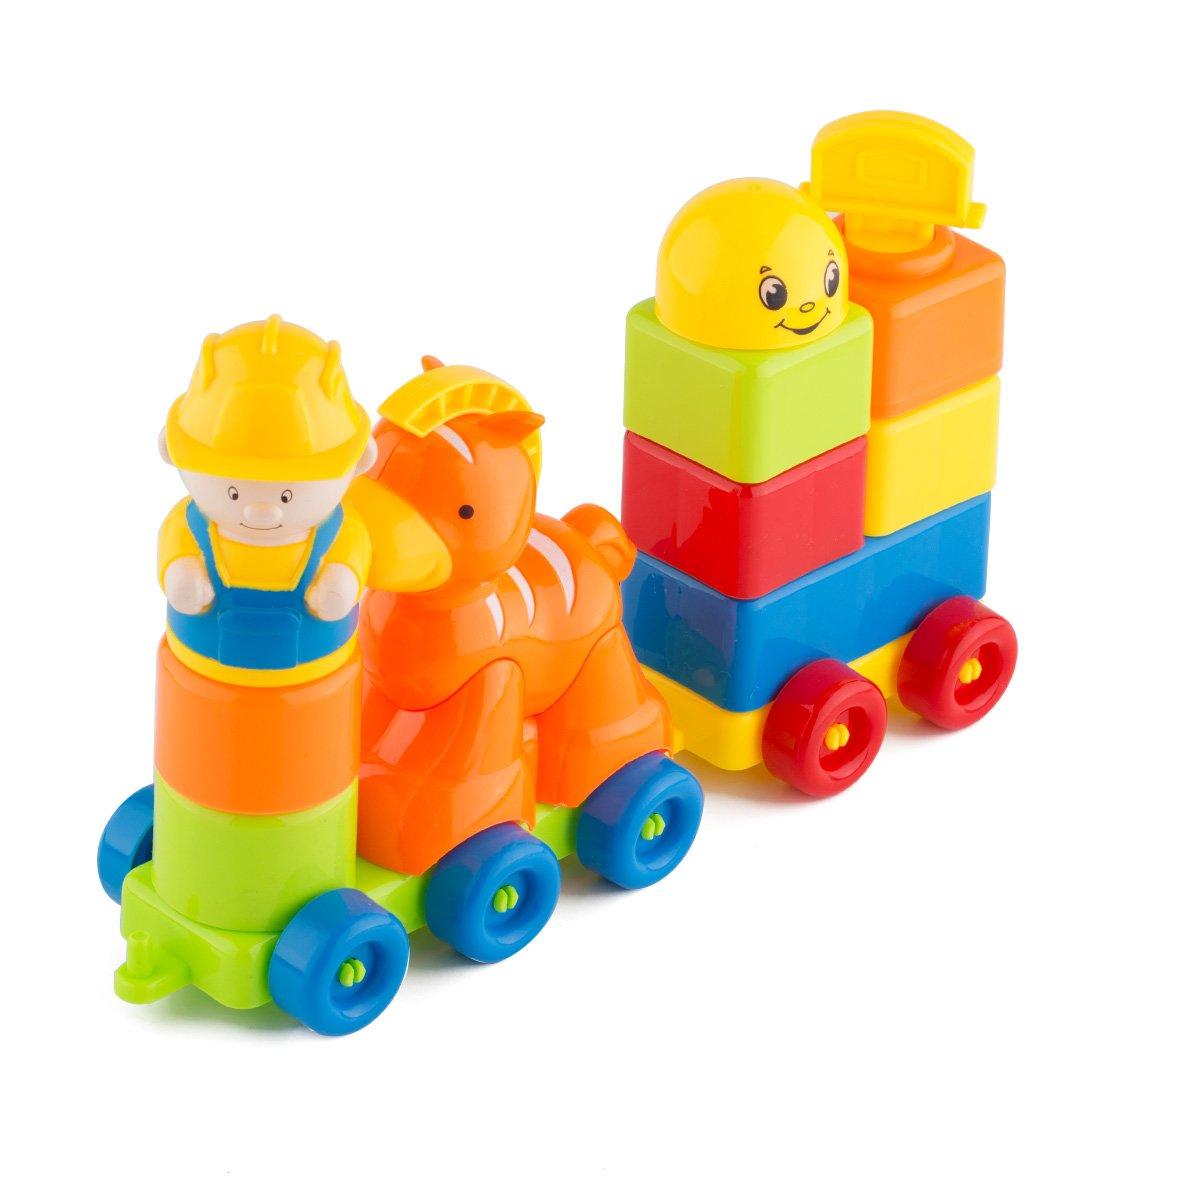 Blocks ShowTop 12 Pieces Building Blocks Children Builders with Storage Bag Orange Trojan by ShowTop   B01L3NS6LC